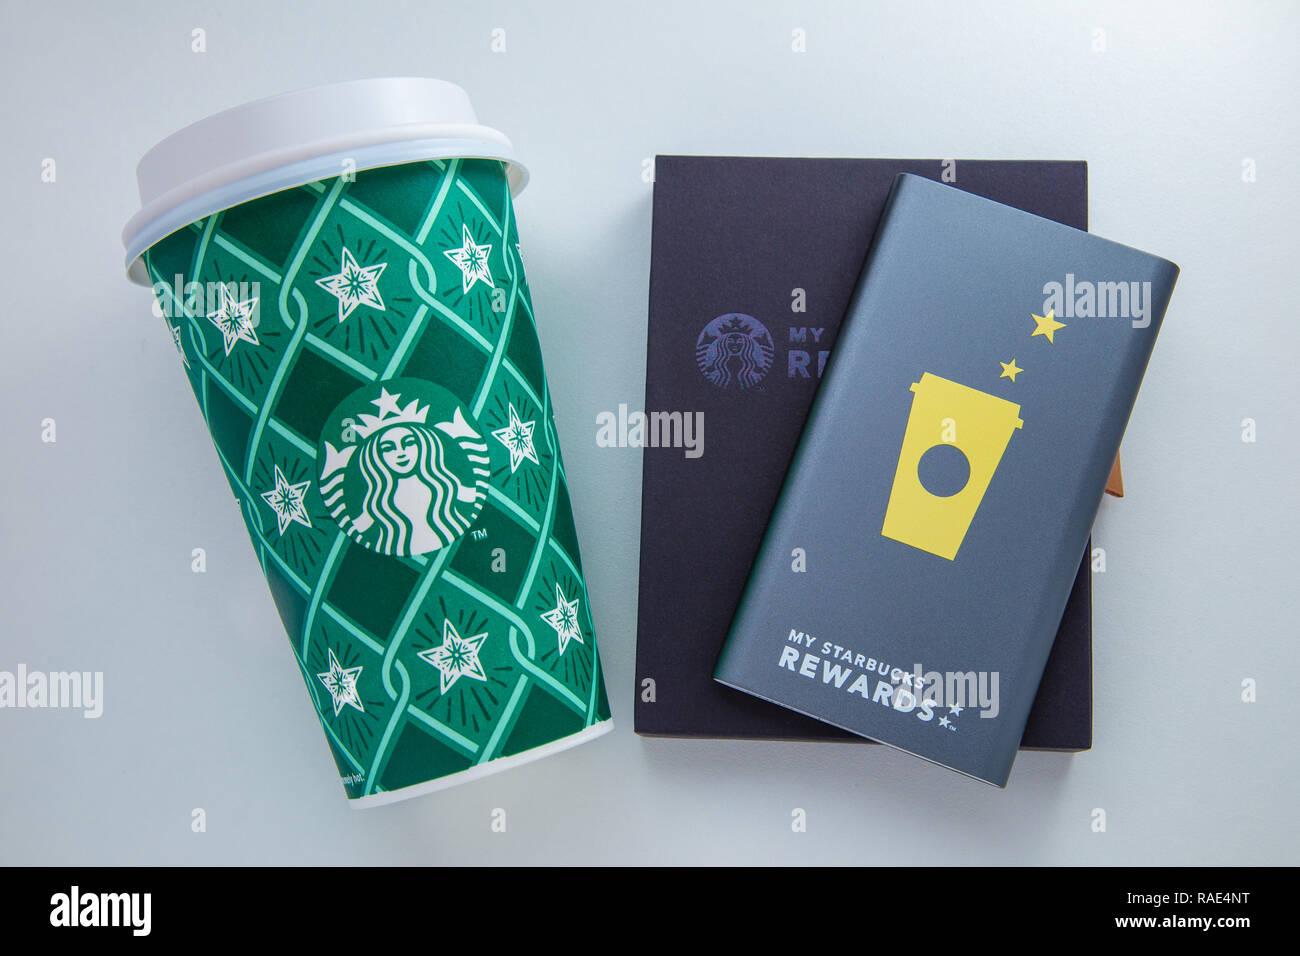 Chiang Mai Thailand 1 January 2019 Starbucks Power Bank